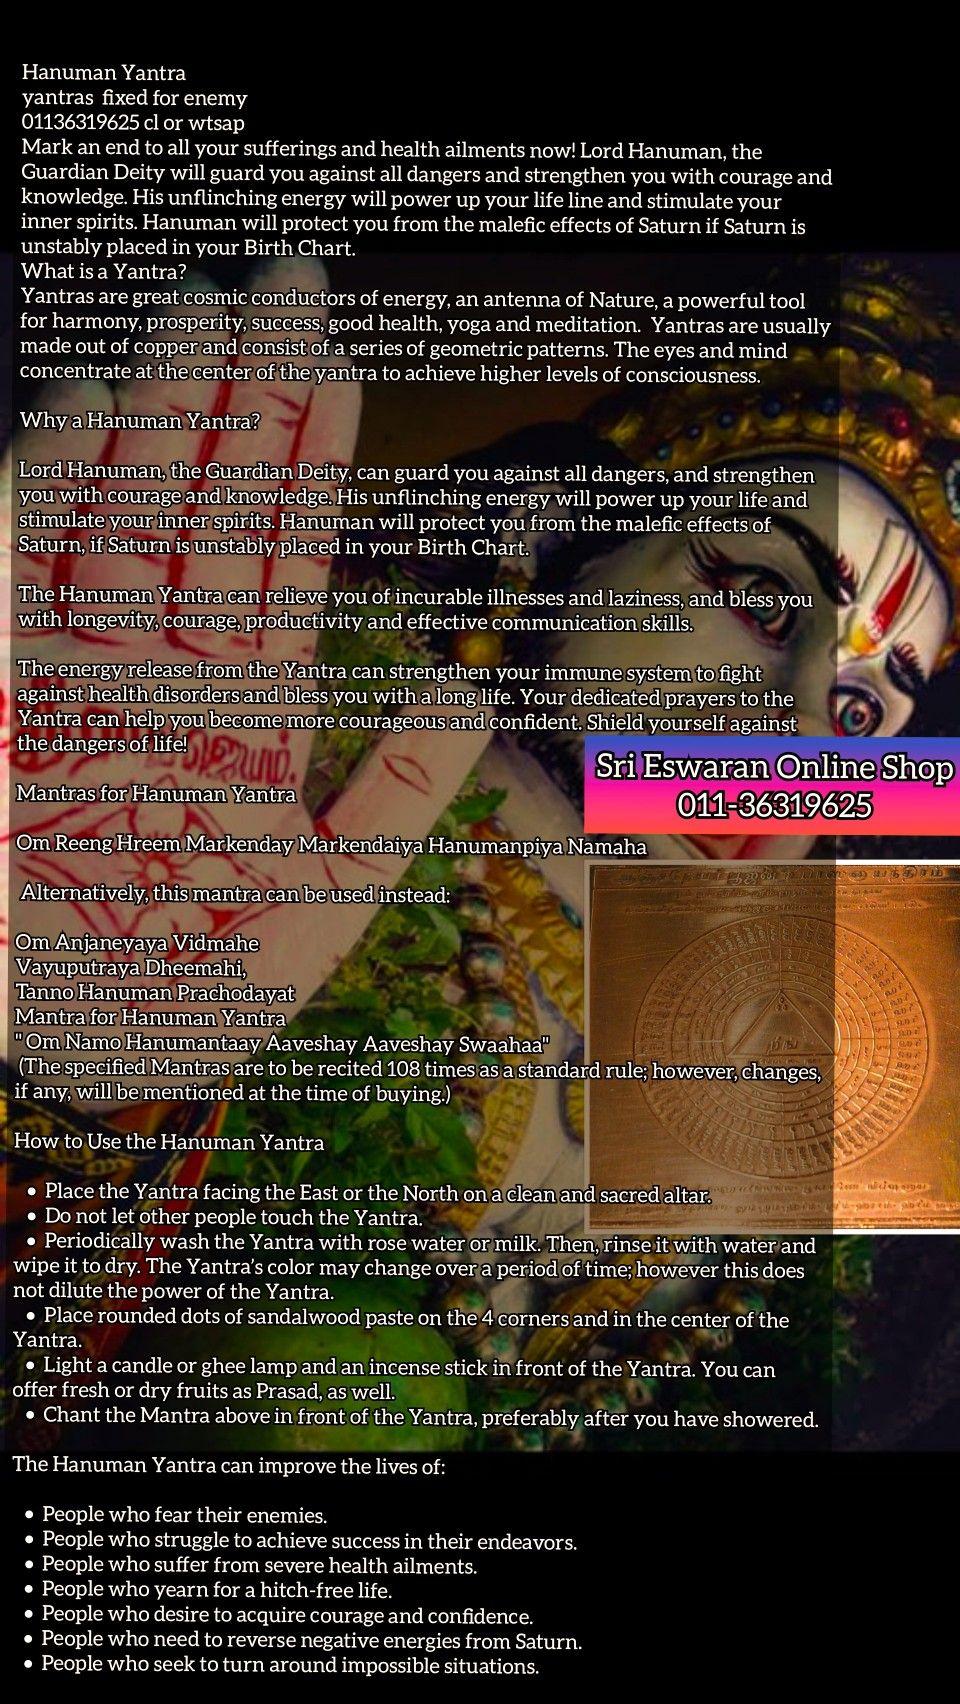 Sri Eswaran Online Shop Hanuman yantra Hanuman Yantra yantras fixed